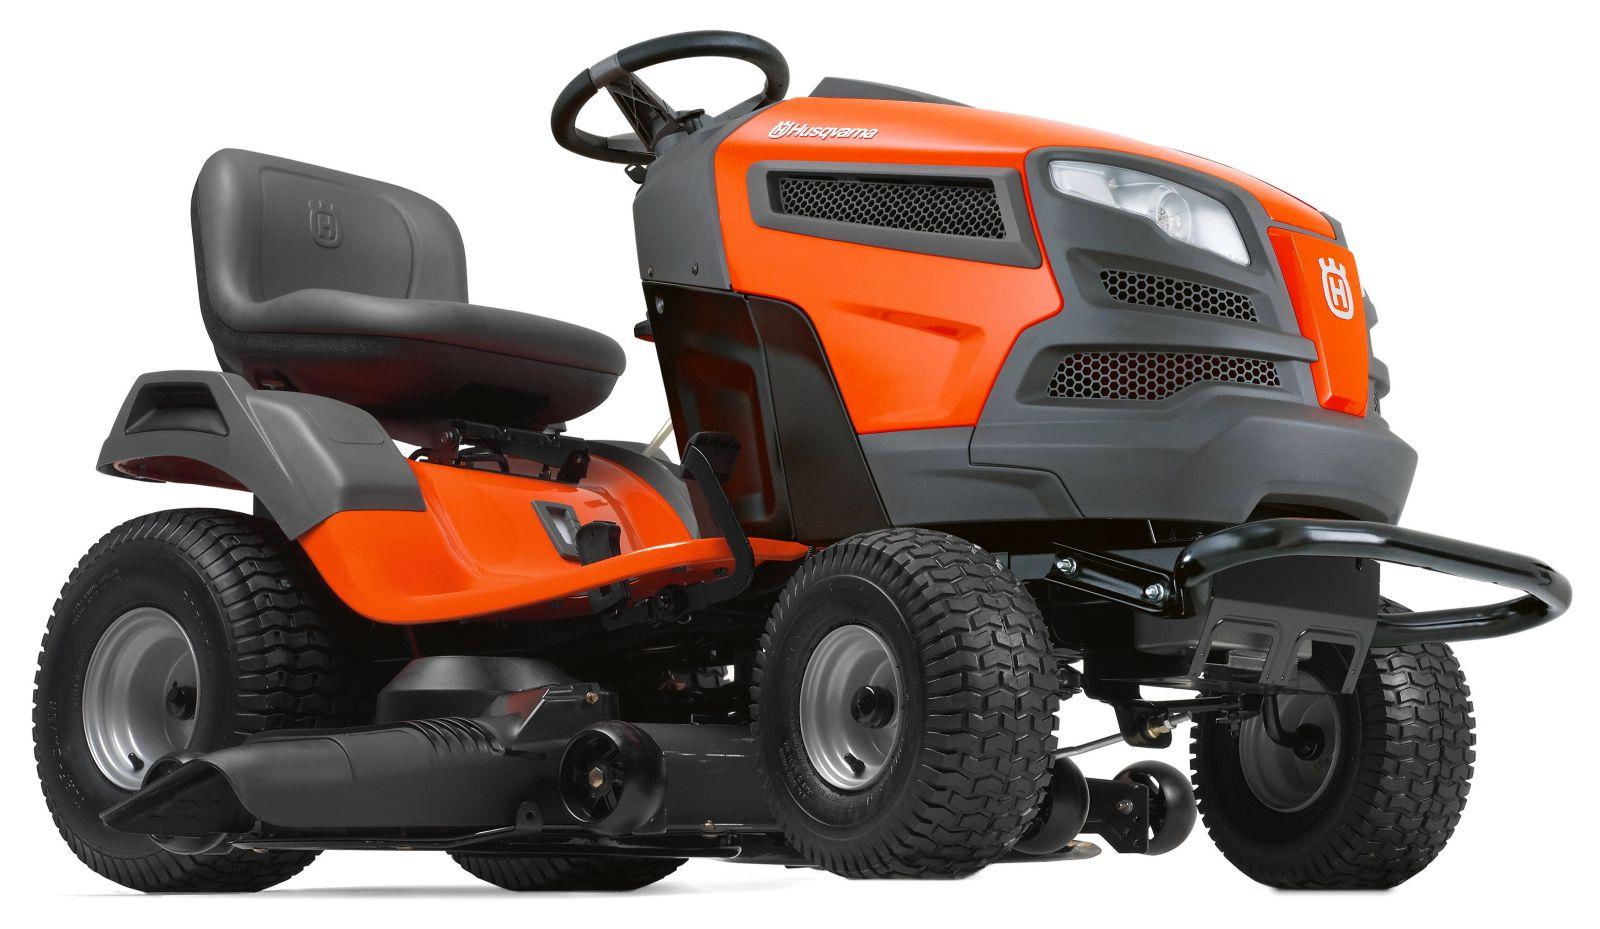 Трактор садовый Husqvarna Ts 243t (9604103-91) oris 643 7636 71 91 rs